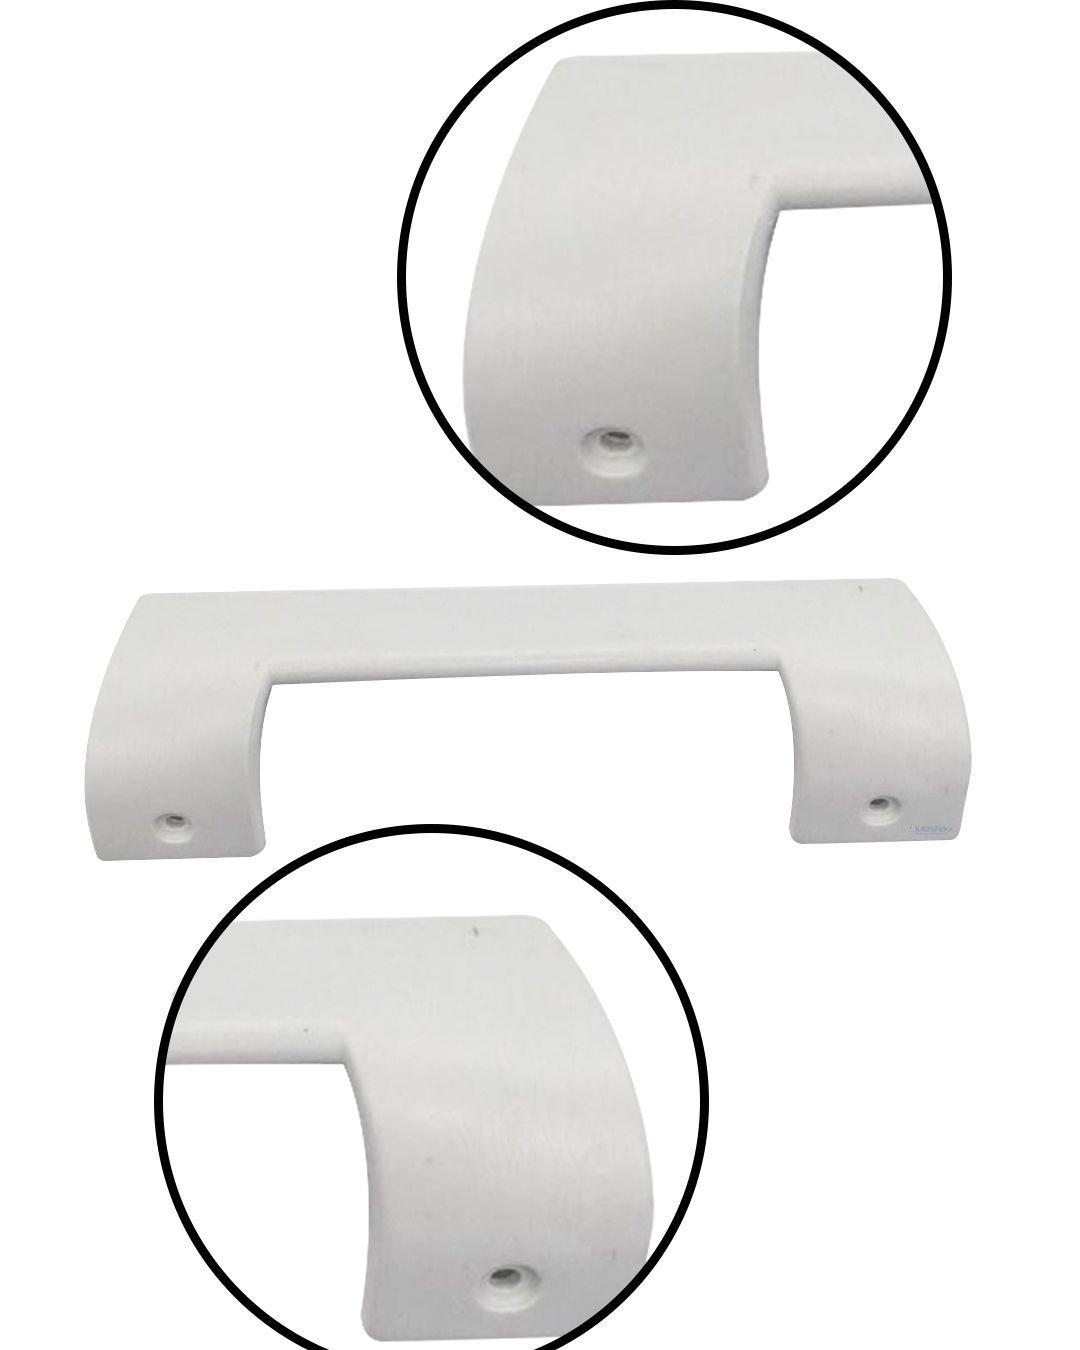 Puxador Branco Continental Rsv35 - Rsv42 - Rsv46 - Rsg33